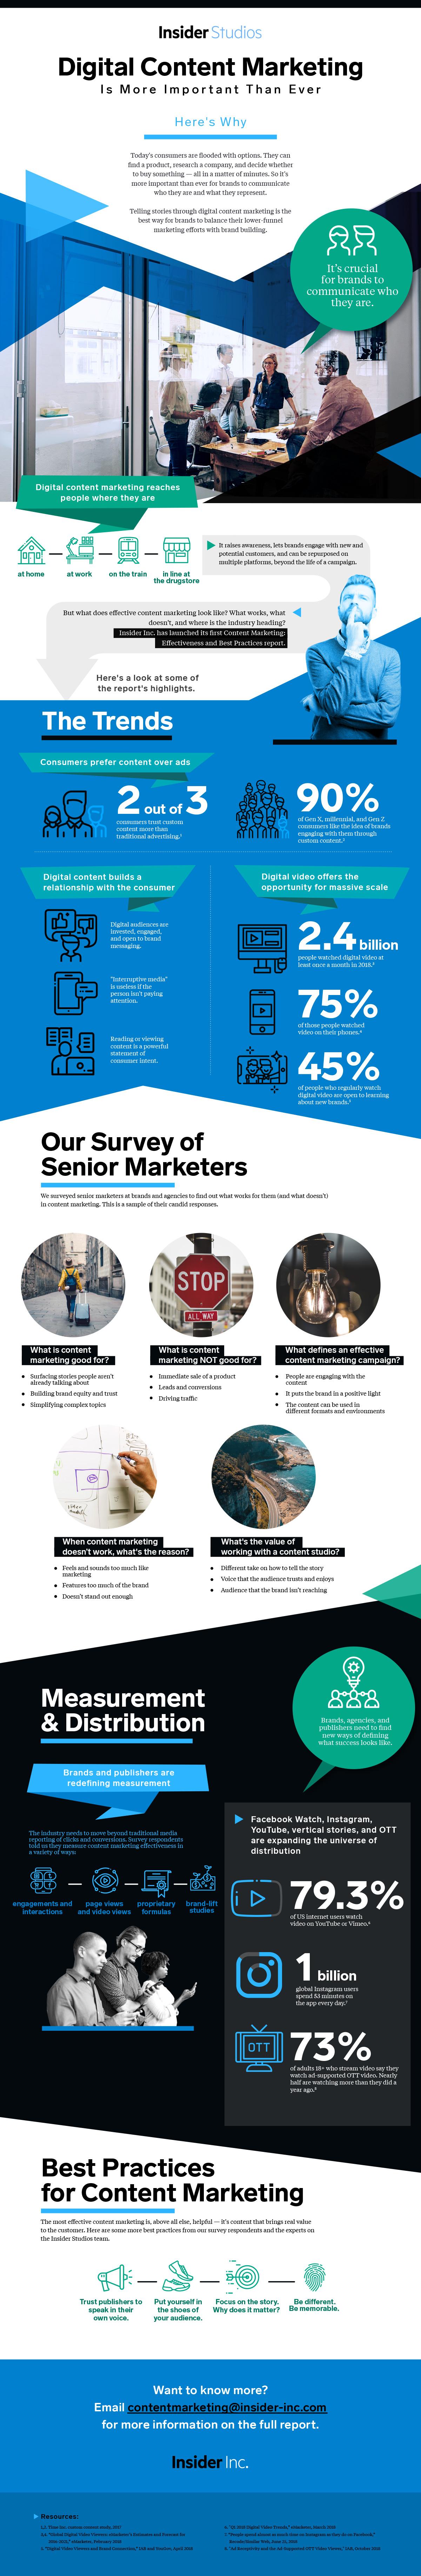 Content-Marketing-Infographic---FINAL.jpg